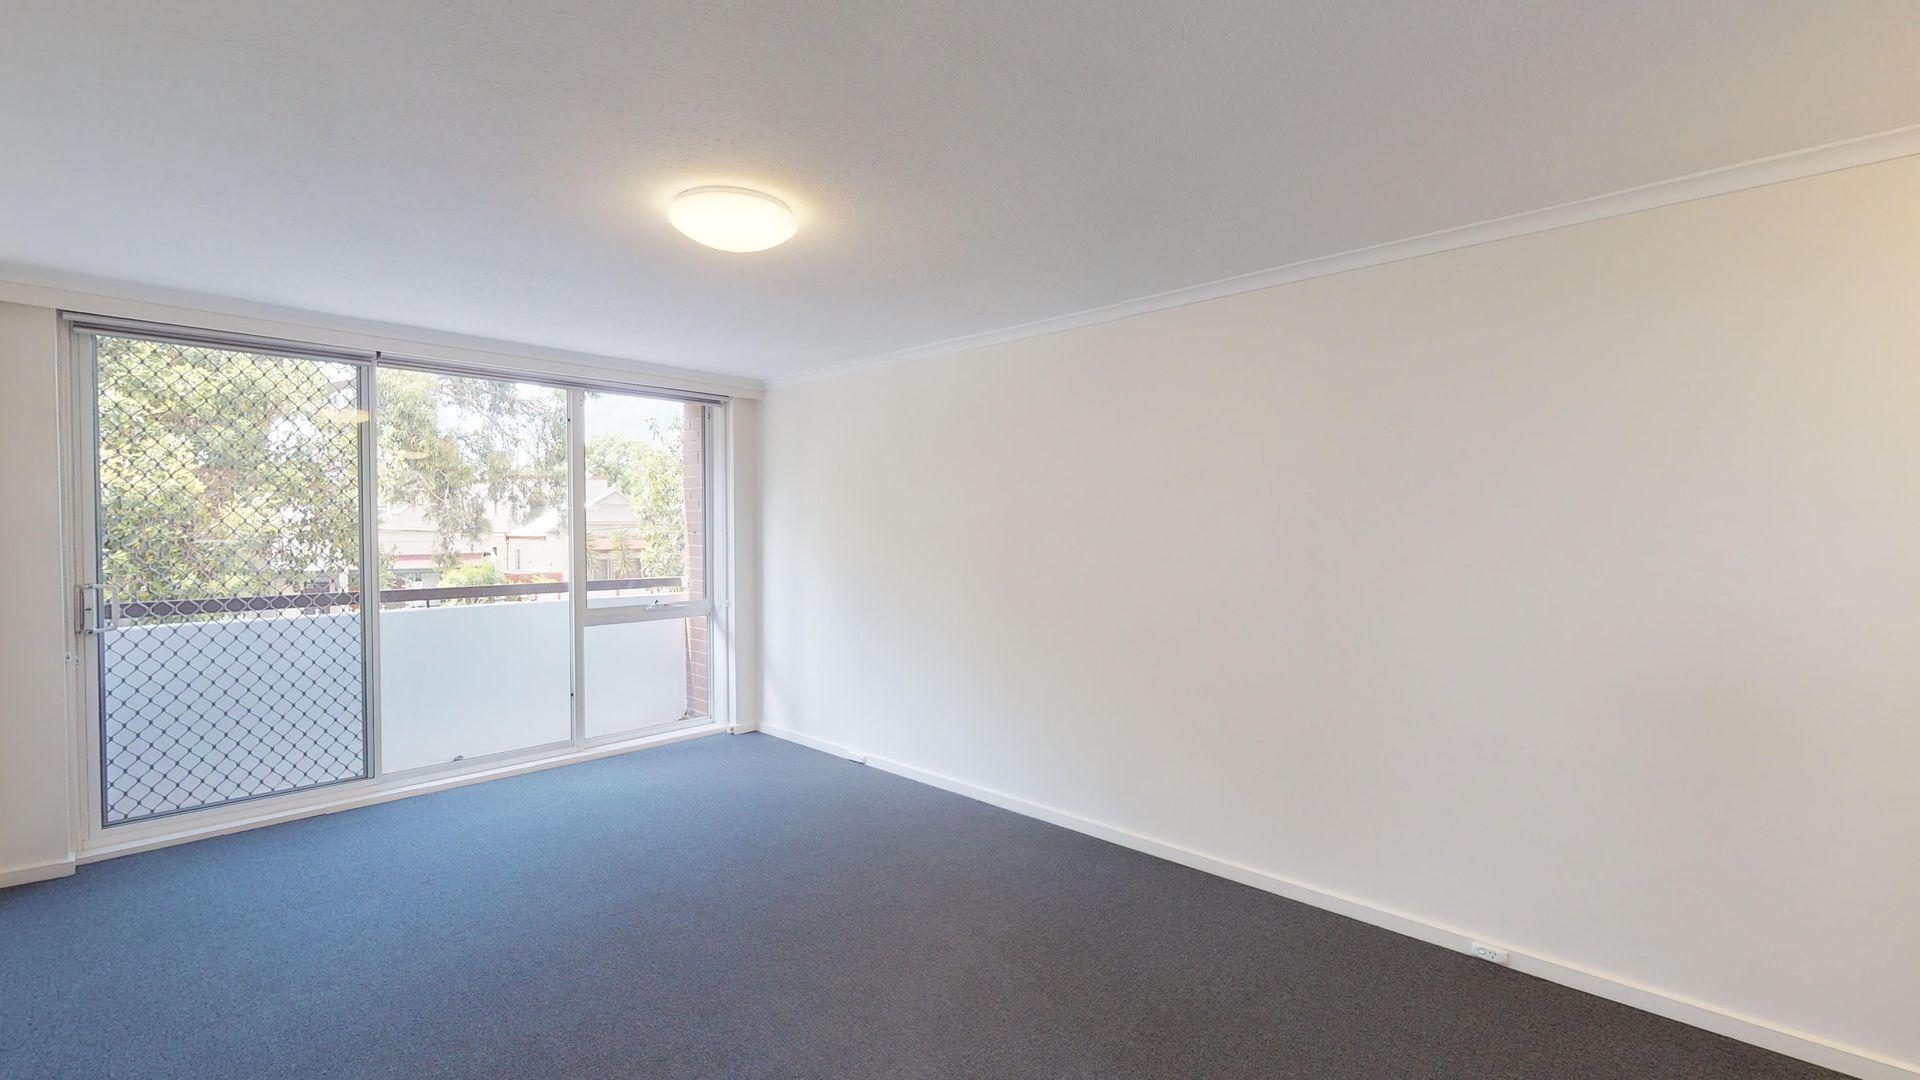 2/7 Curran Street, North Melbourne VIC 3051, Image 1